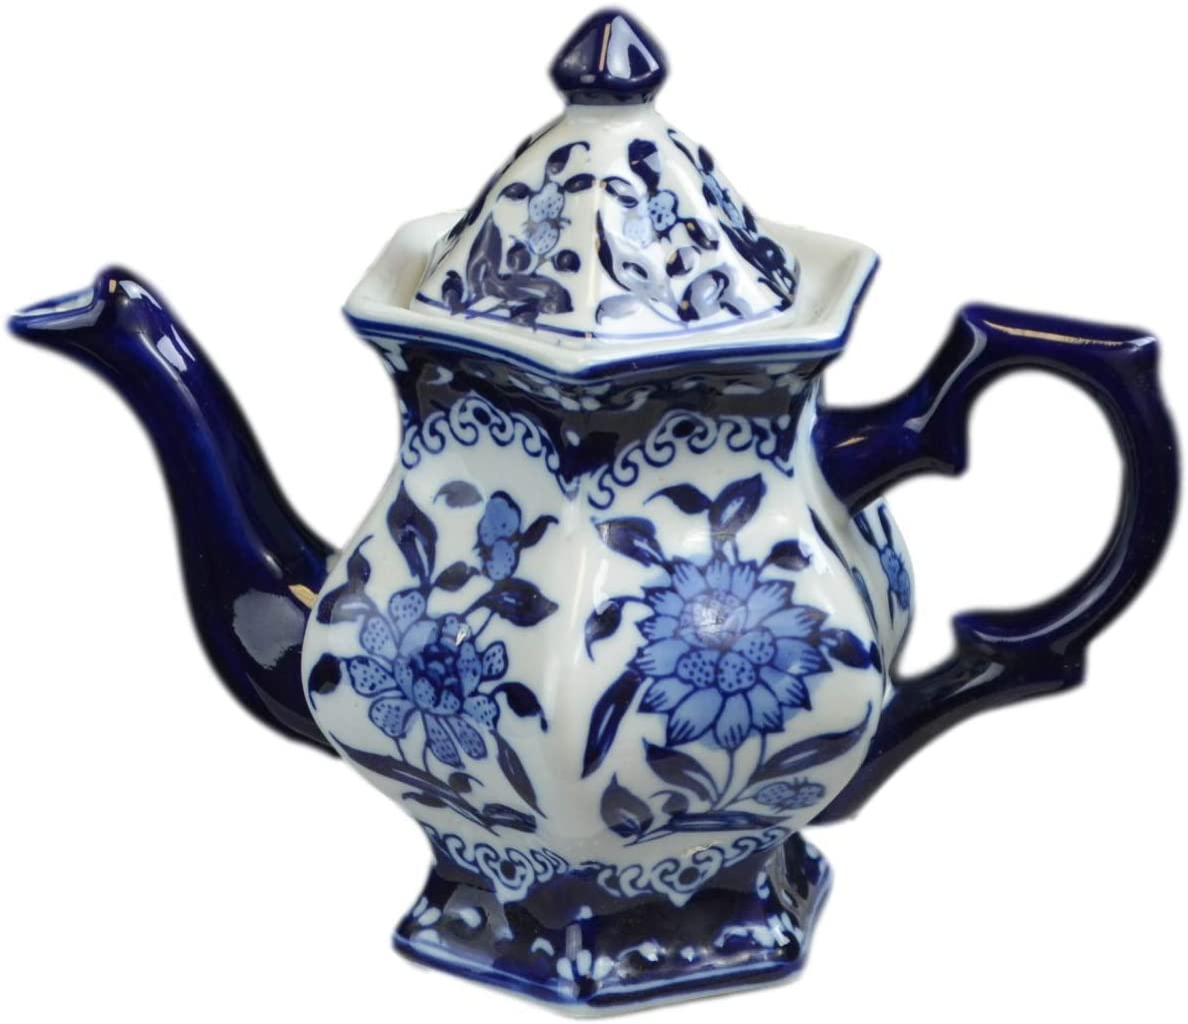 Coffee Pot, Hexagonal Teapot Blue and White Porcelain 16 Ounce China